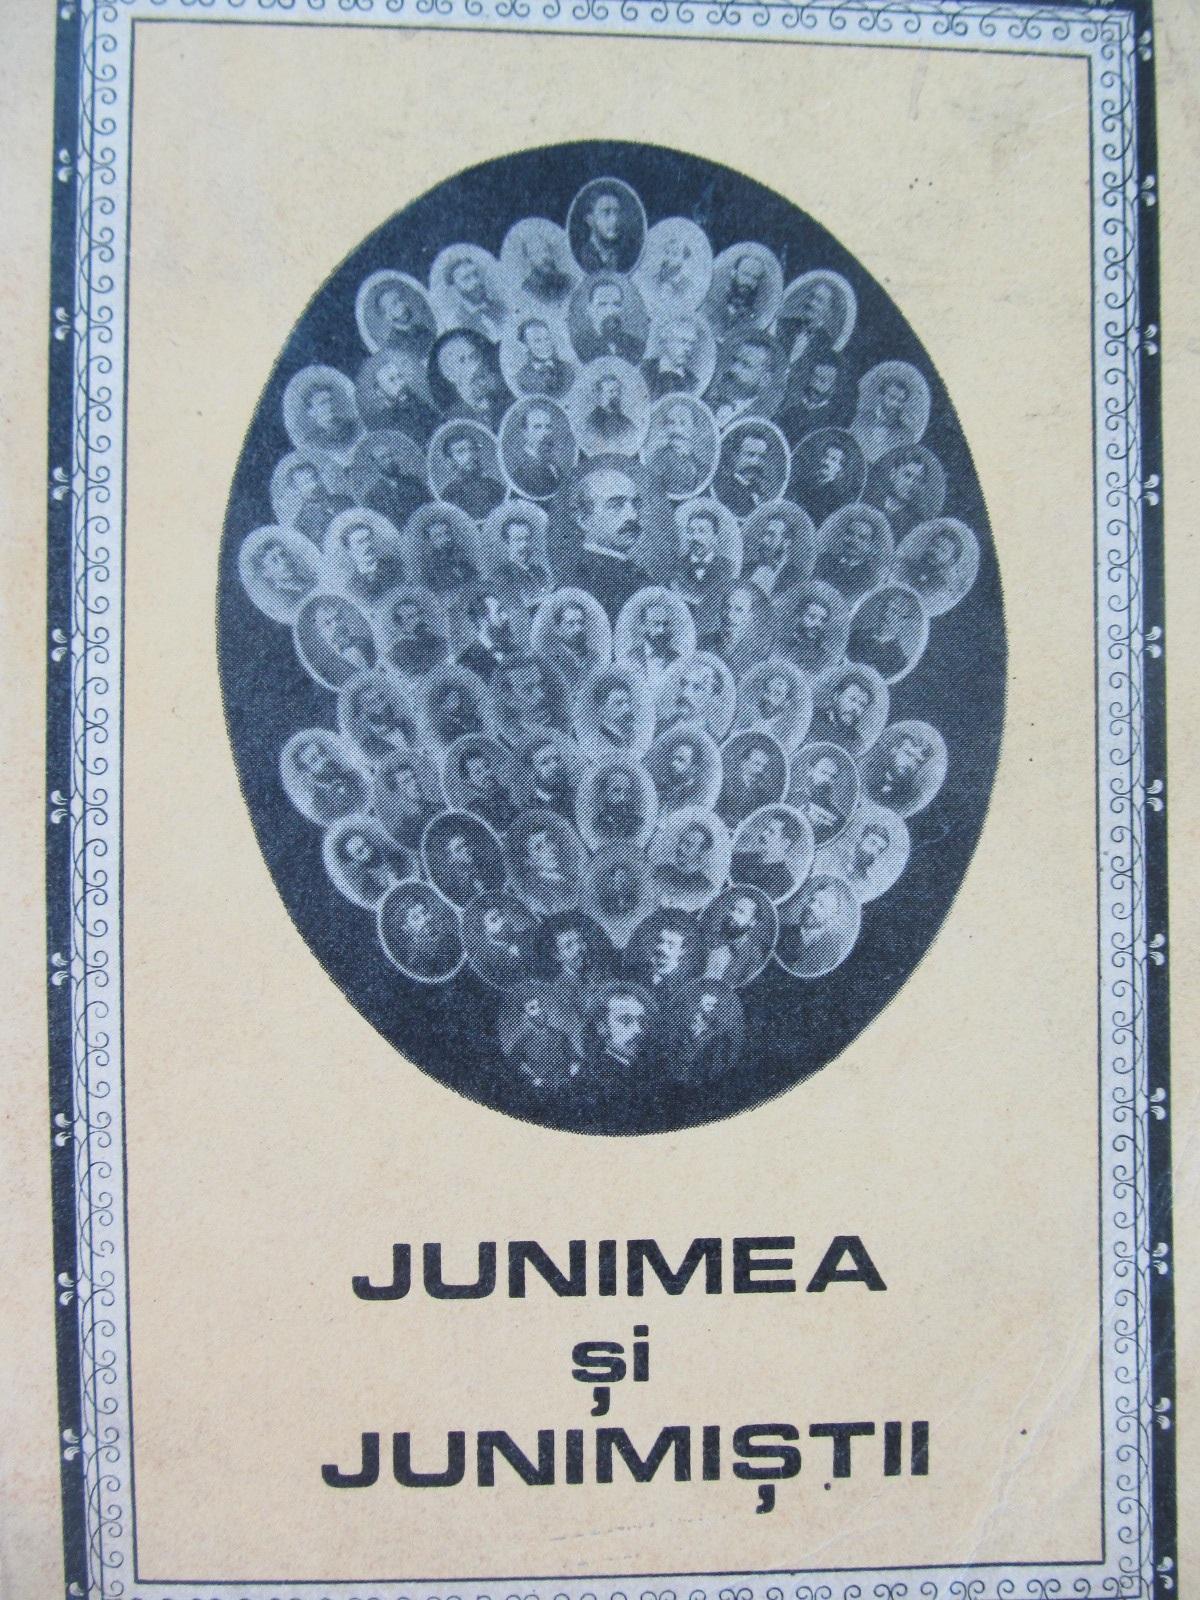 Junimea si junimistii - Scrisori si documente inedite - Ion Arhip , Dumitru Vacariu | Detalii carte